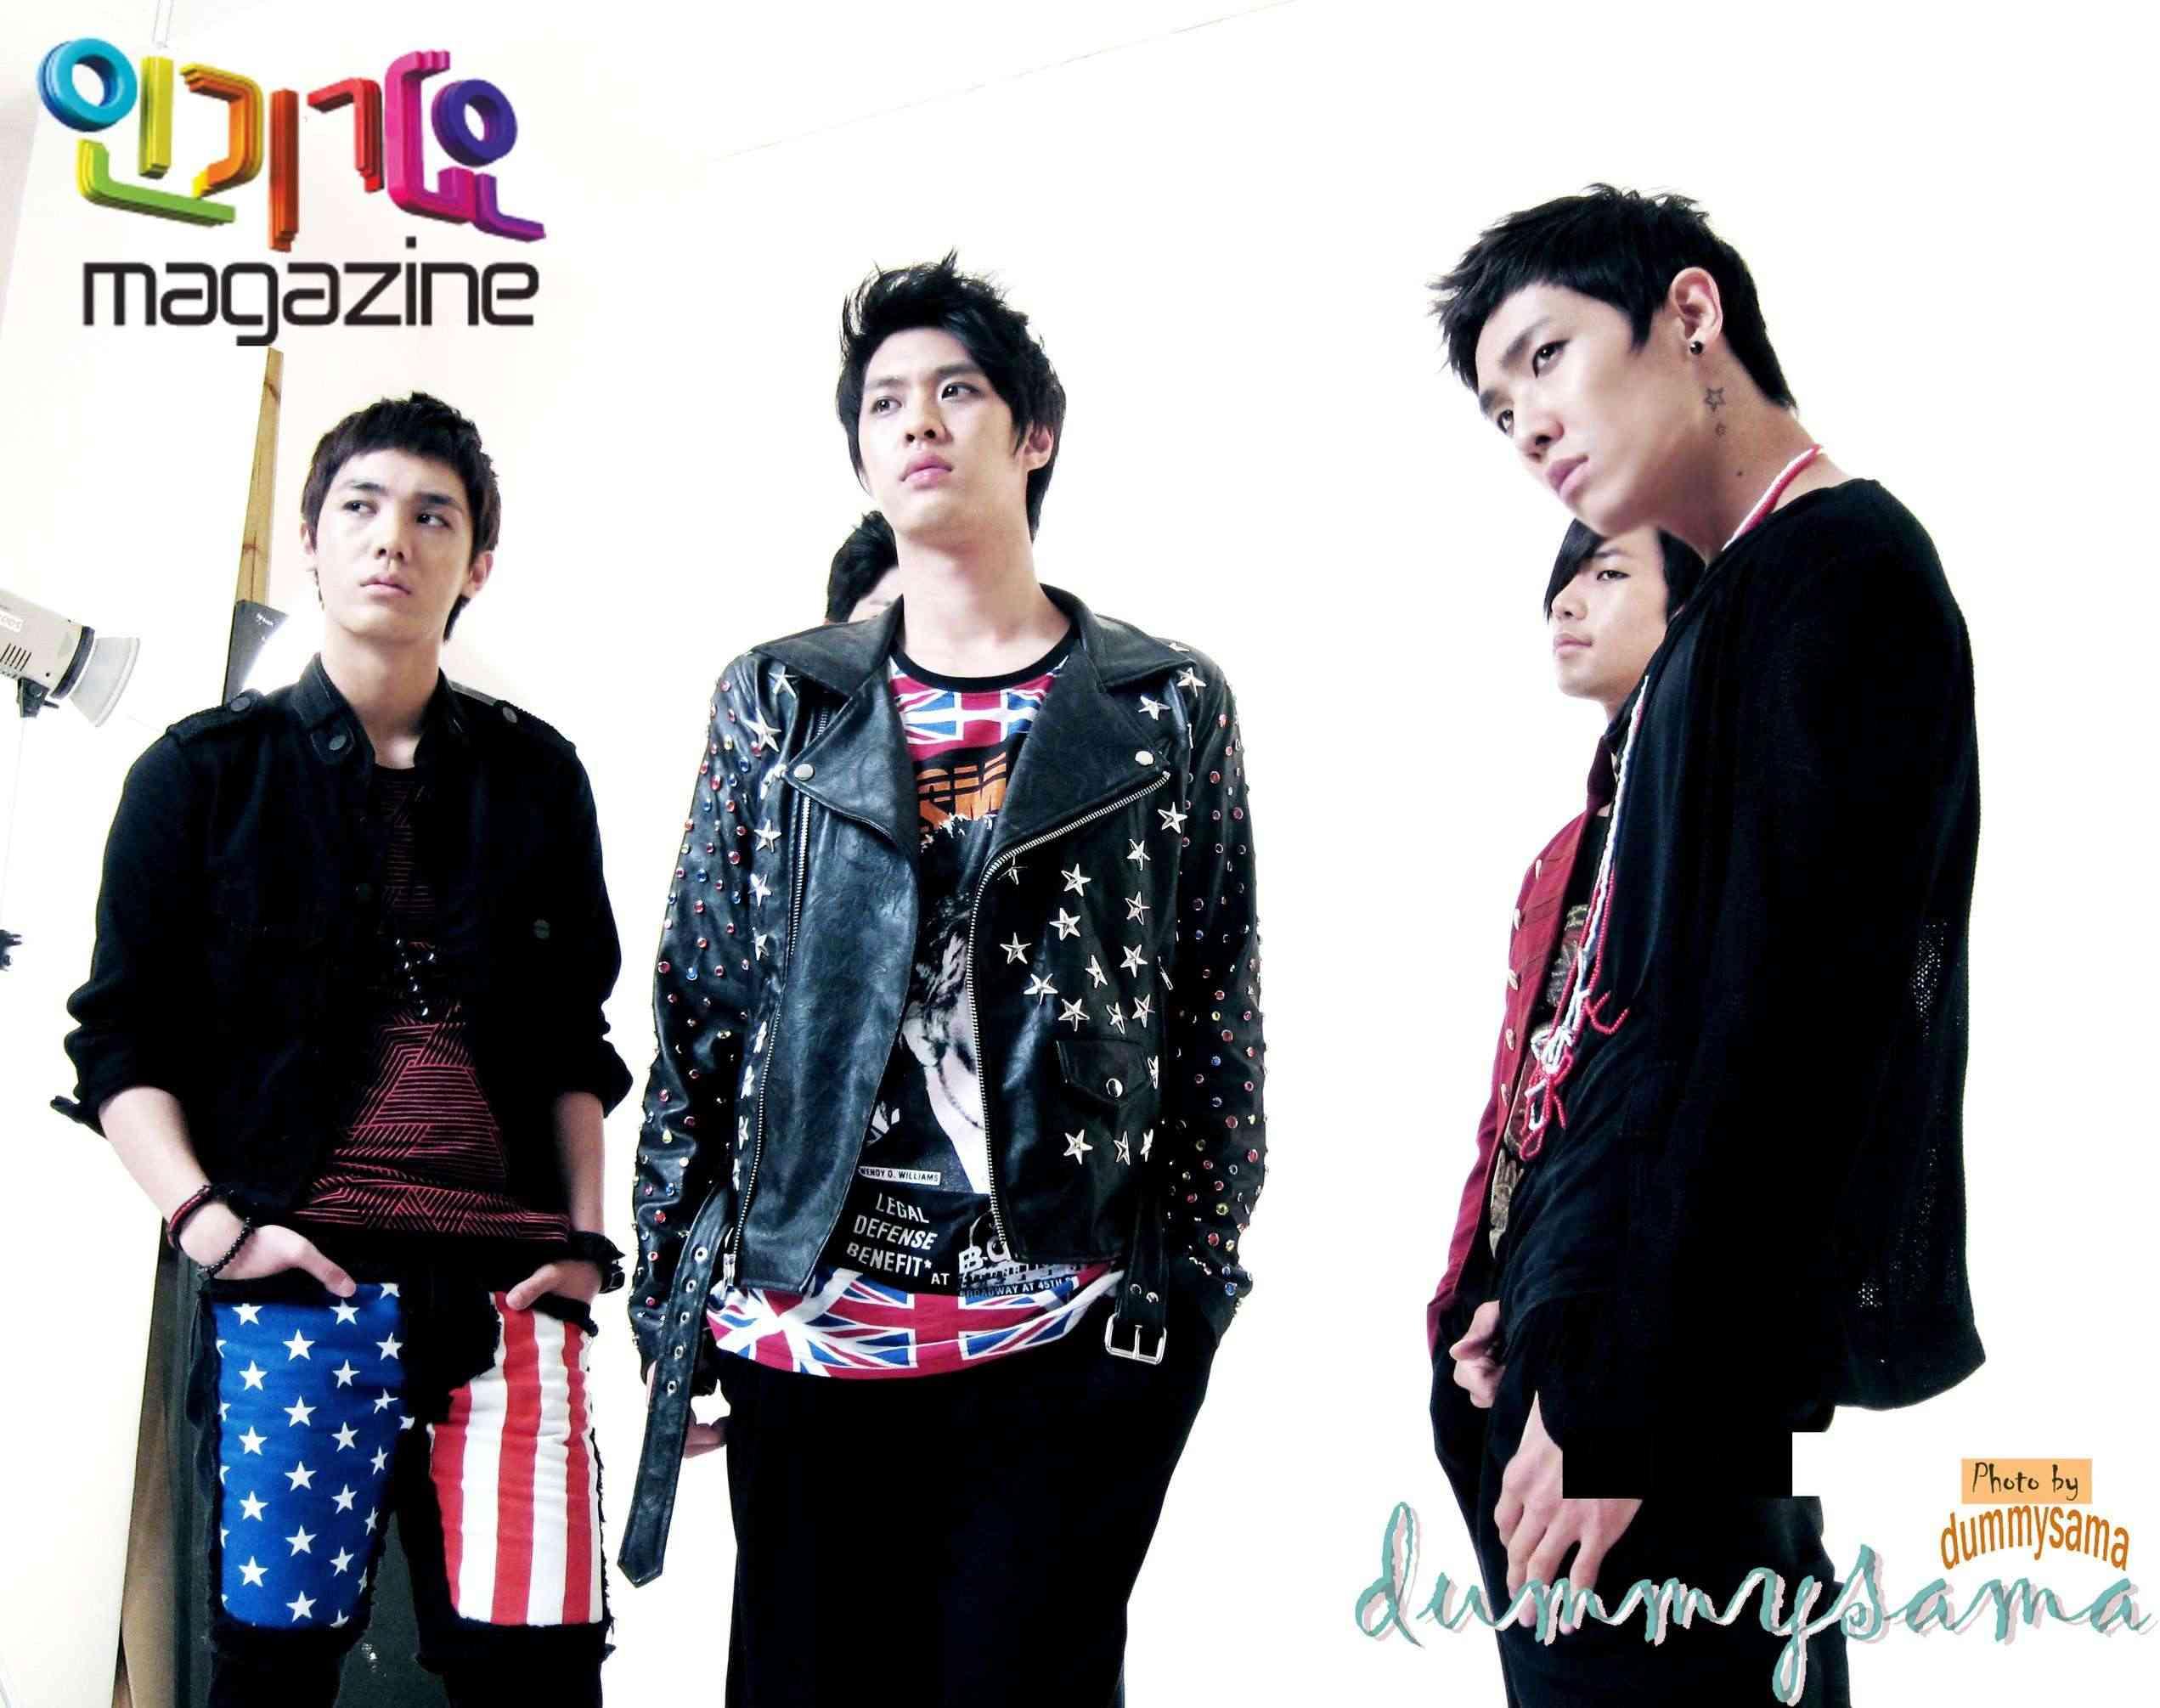 [Pics] Inkigayo Magazine 7ec9b910